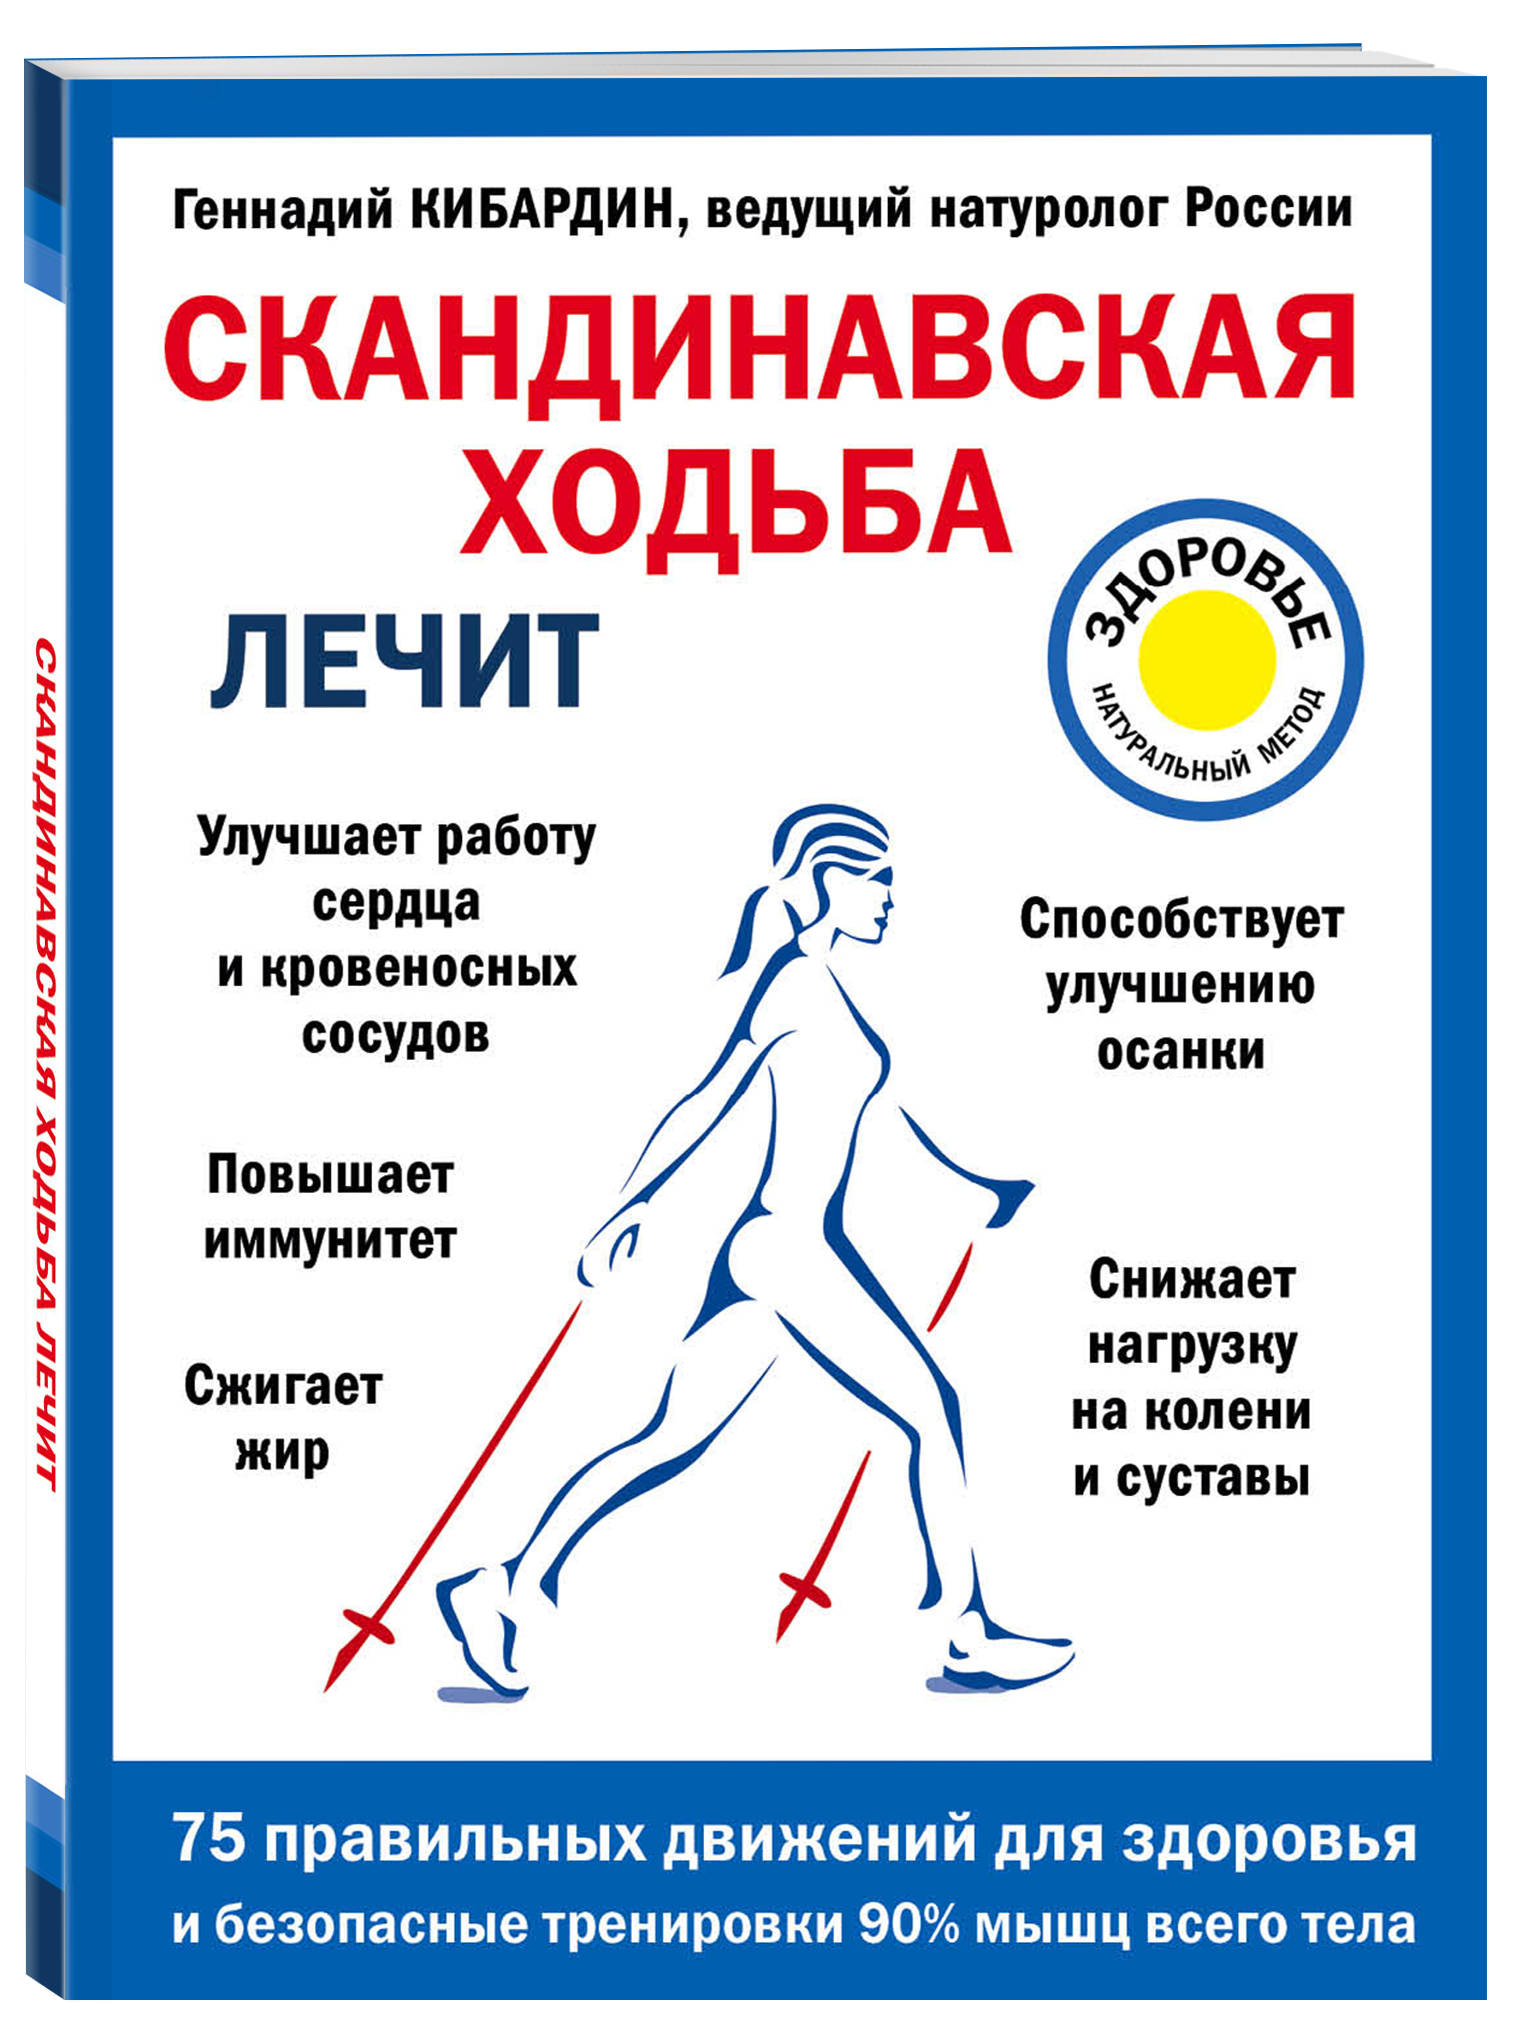 Скандинавская ходьба лечит ( Кибардин Г.М.  )